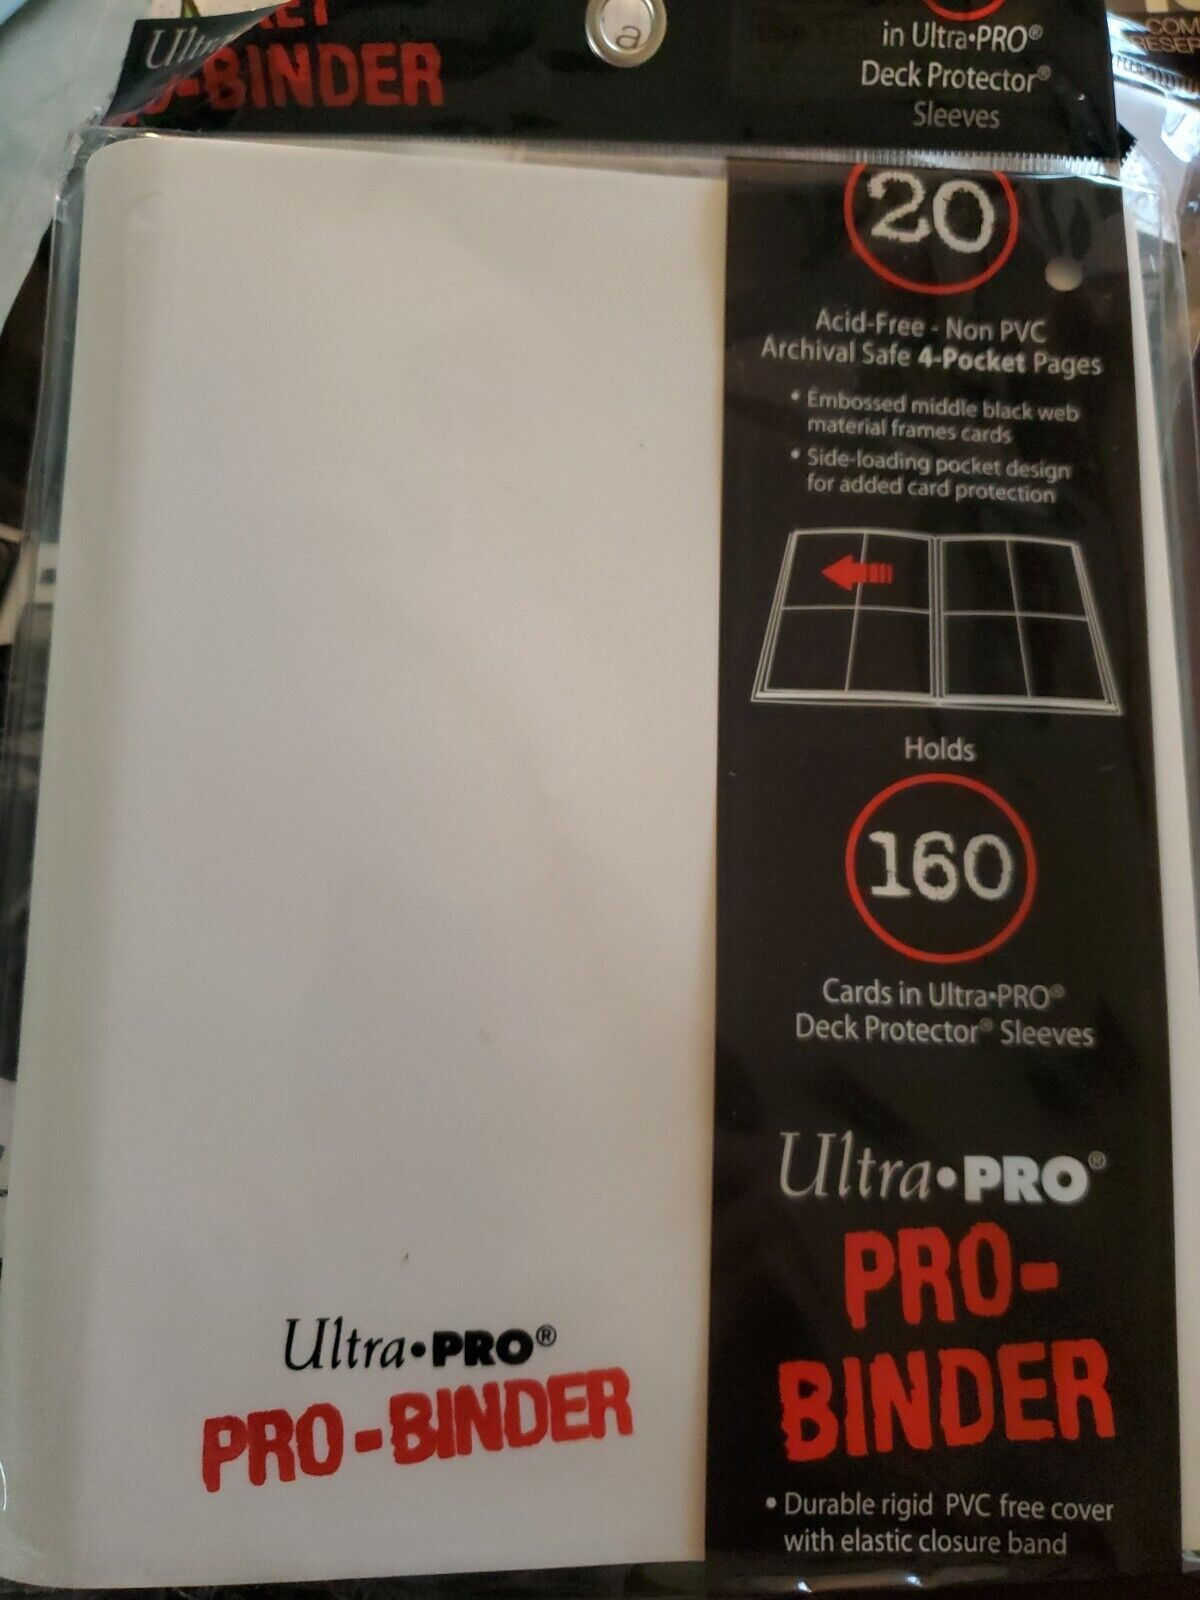 Ultra Pro PRO-Binder White 4-Pocket